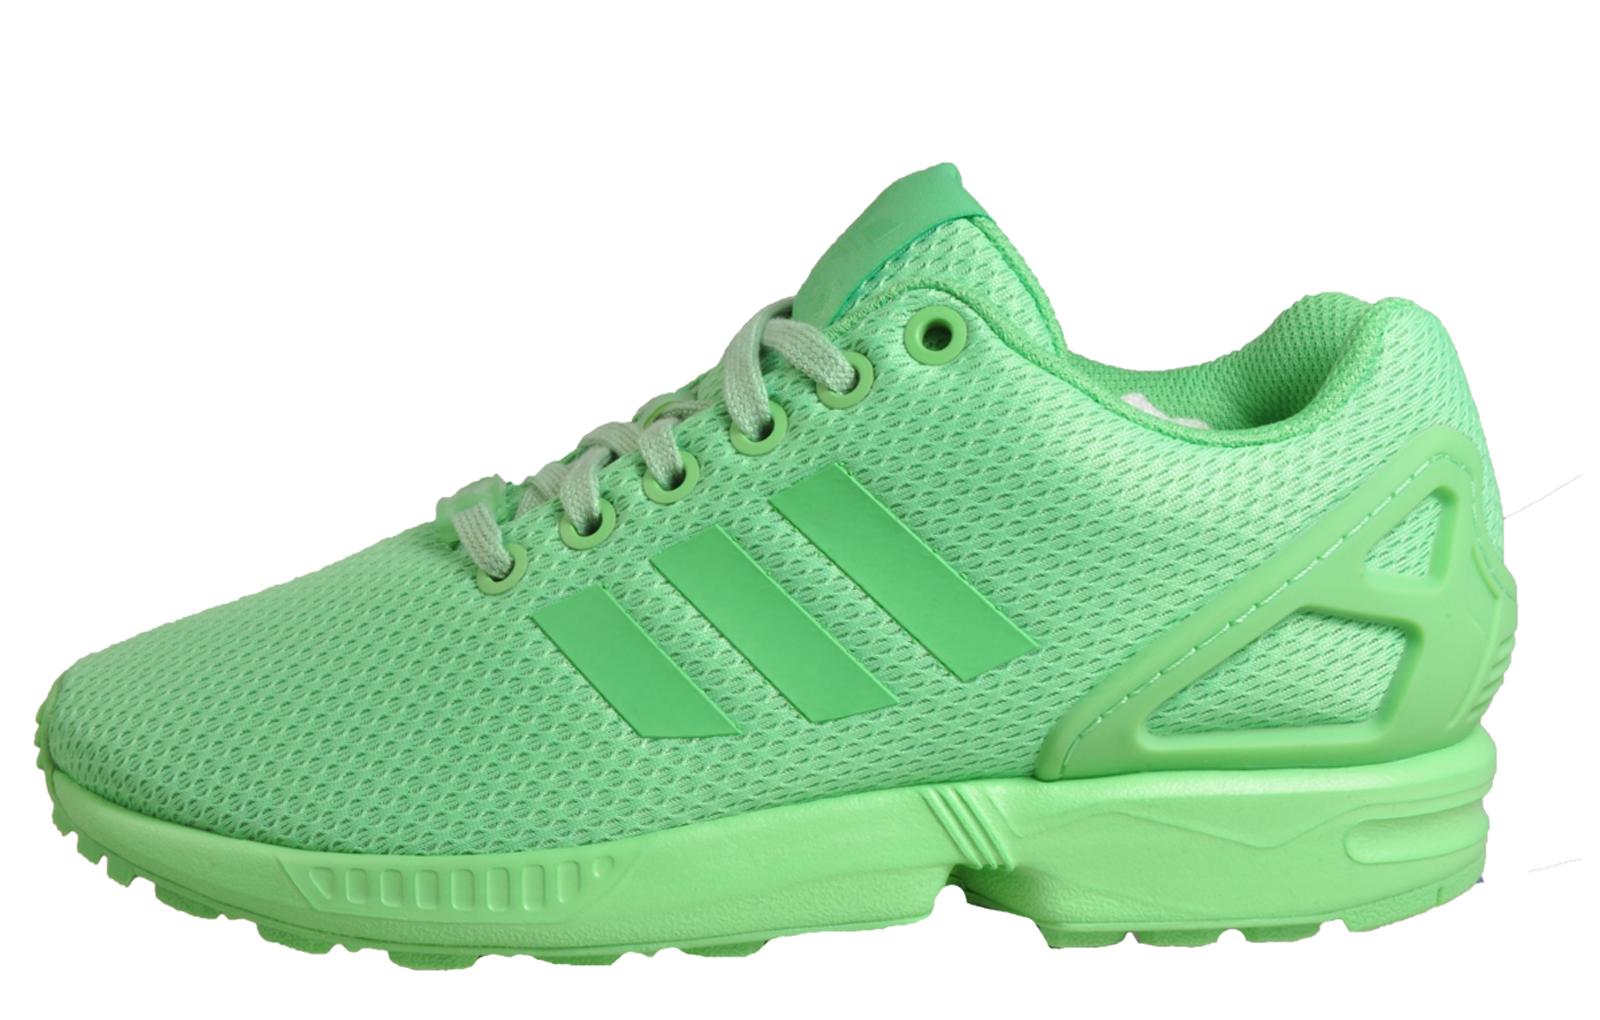 ADIDAS Originals ZX FLUX WOMEN'S CLASSIC Casual Palestra Fitness Scarpe da ginnastica Green | eBay